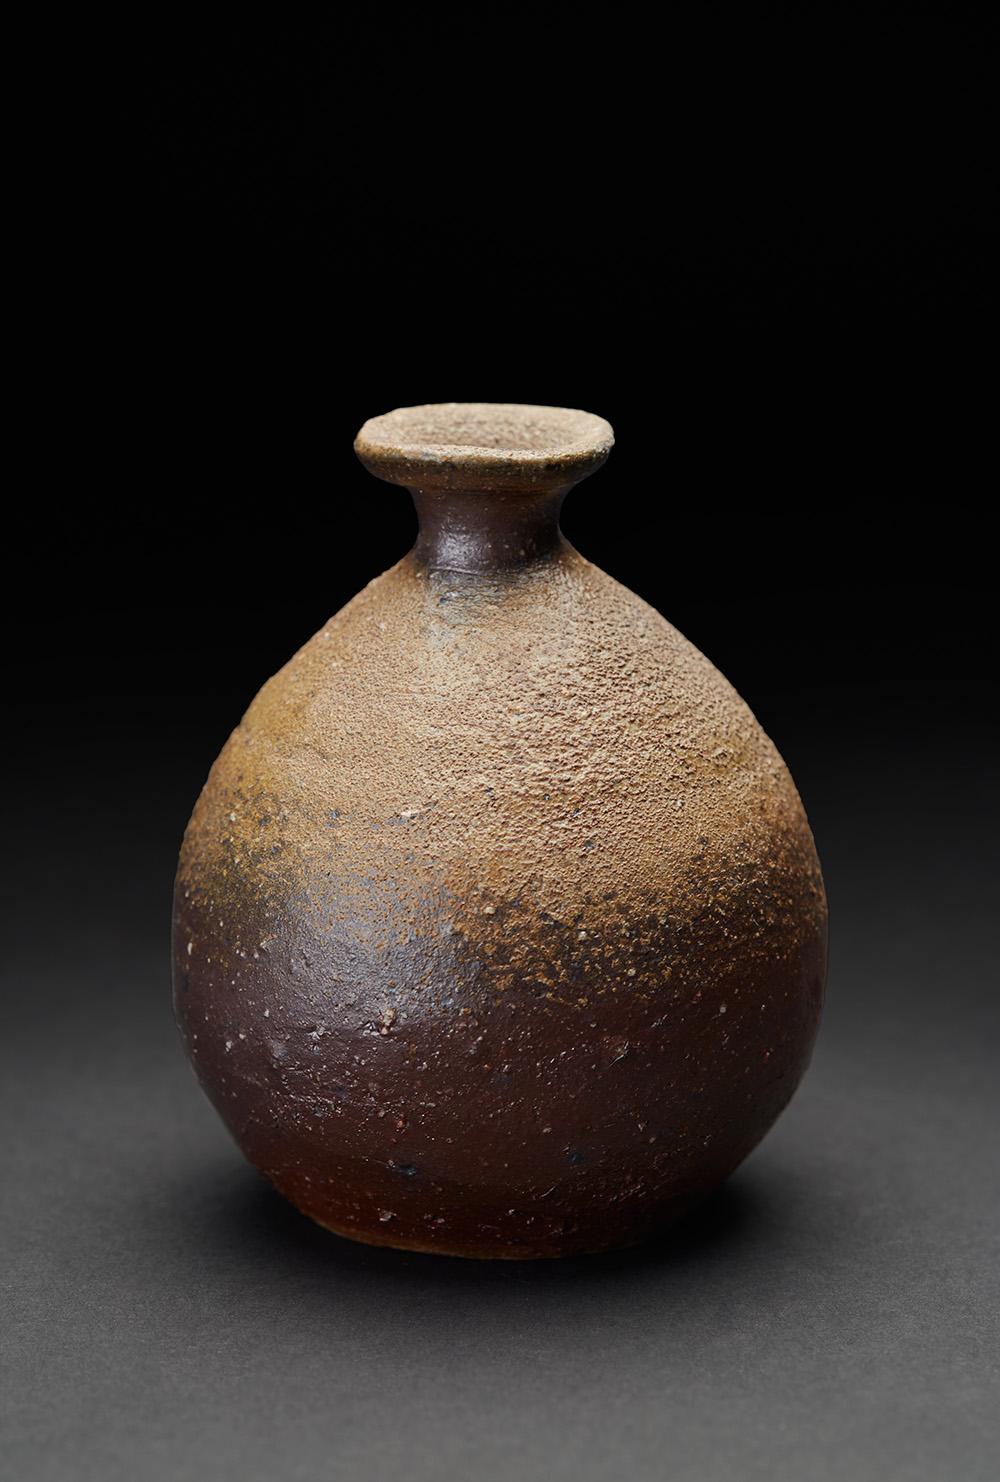 Hiroyuki Wakimoto    Tokkuri  , 2005 Woodfired clay 5 x 3.75 x 3.25 inches 12.7 x 9.5 x 8.3 cm HWak 8